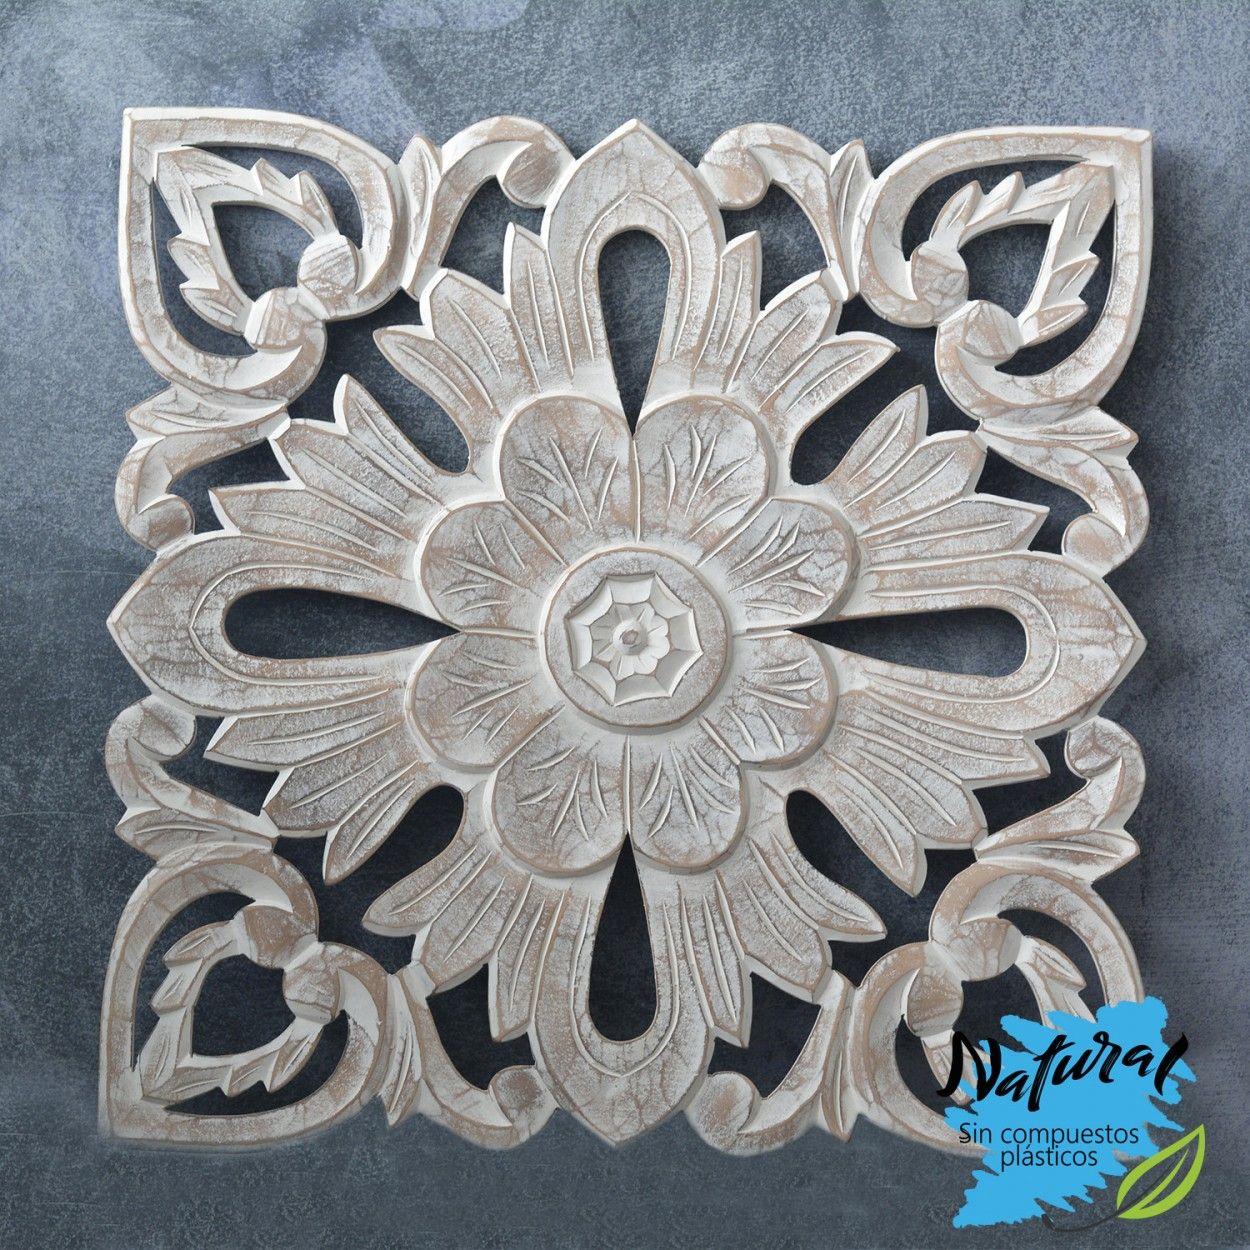 Comprar online decoraci n de pared de madera tallada for Diseno hogar online